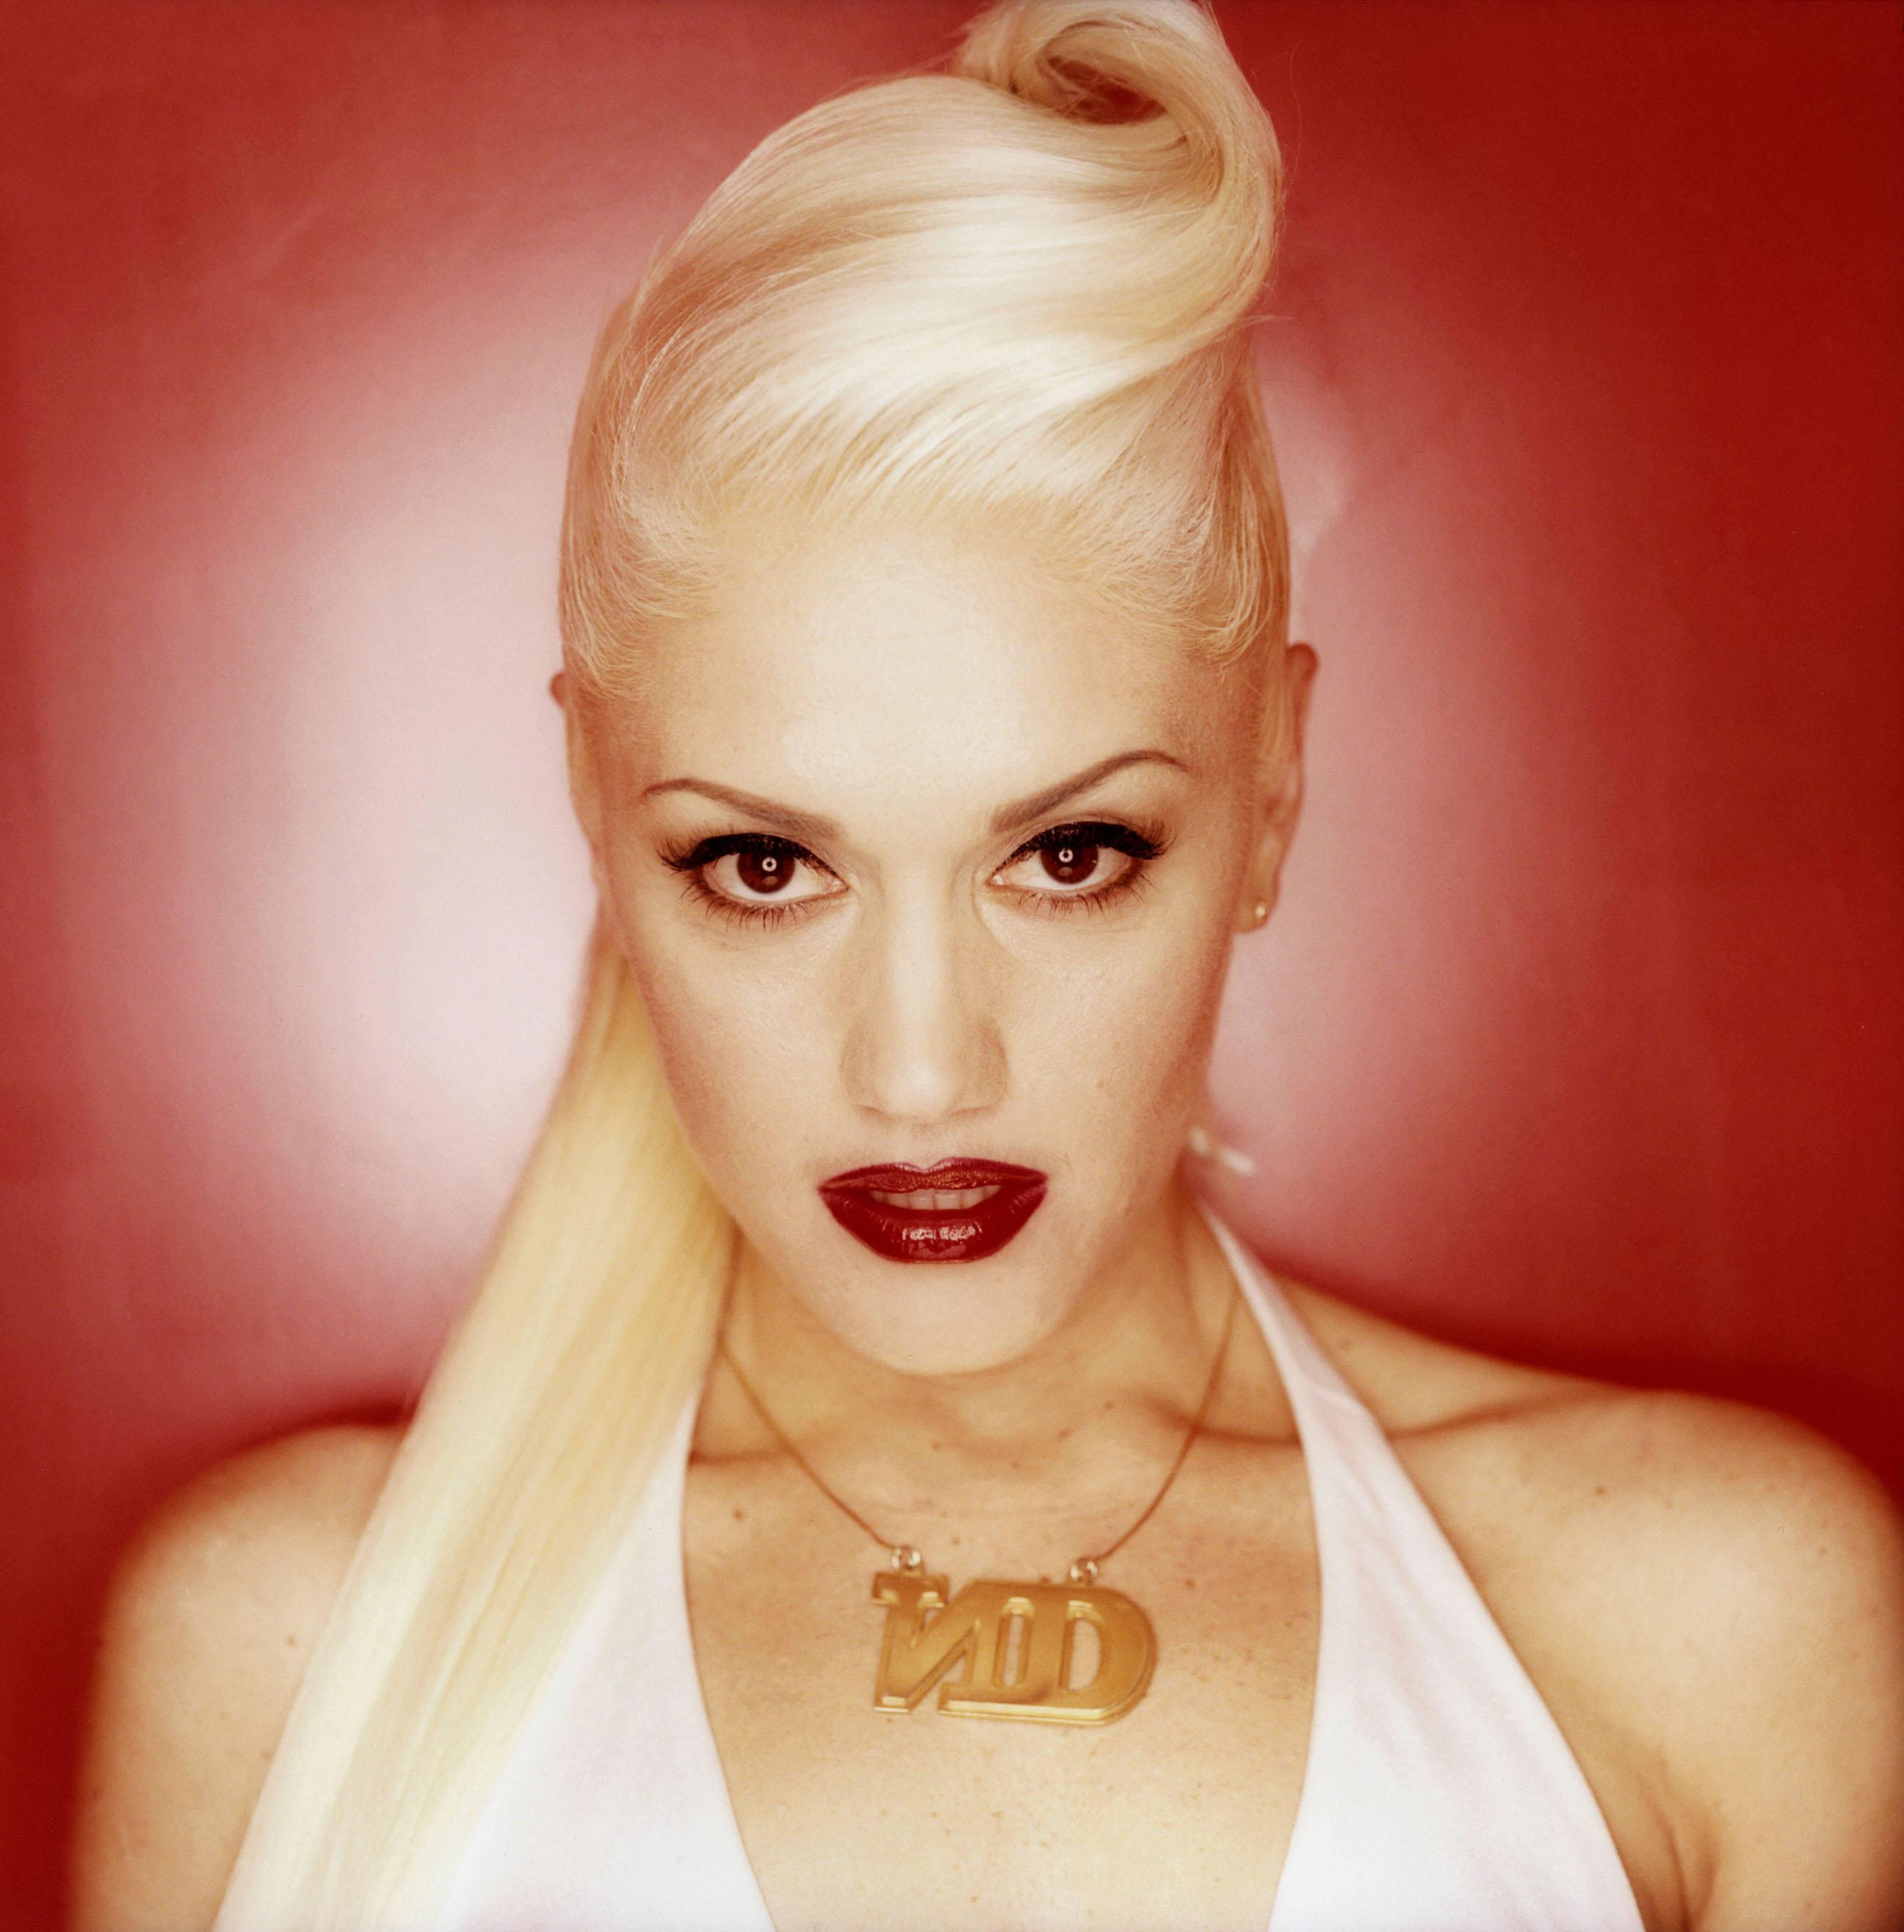 Gwen Stefani photo 13 of 1063 pics, wallpaper - photo ... гвен стефани